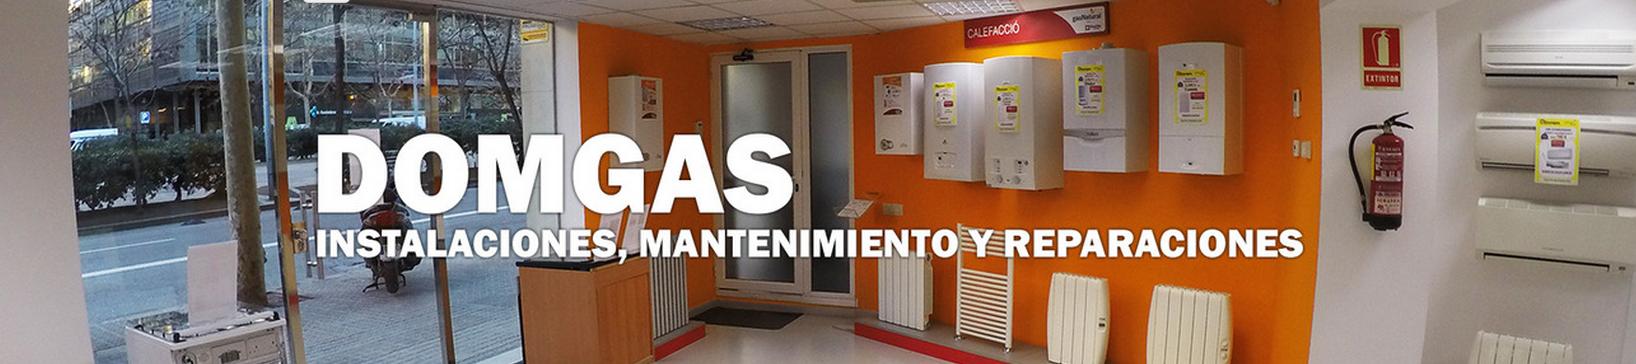 Domgas instaladores de sistemas de climatizaci n en barcelona blog de opt media - Calderas en barcelona ...